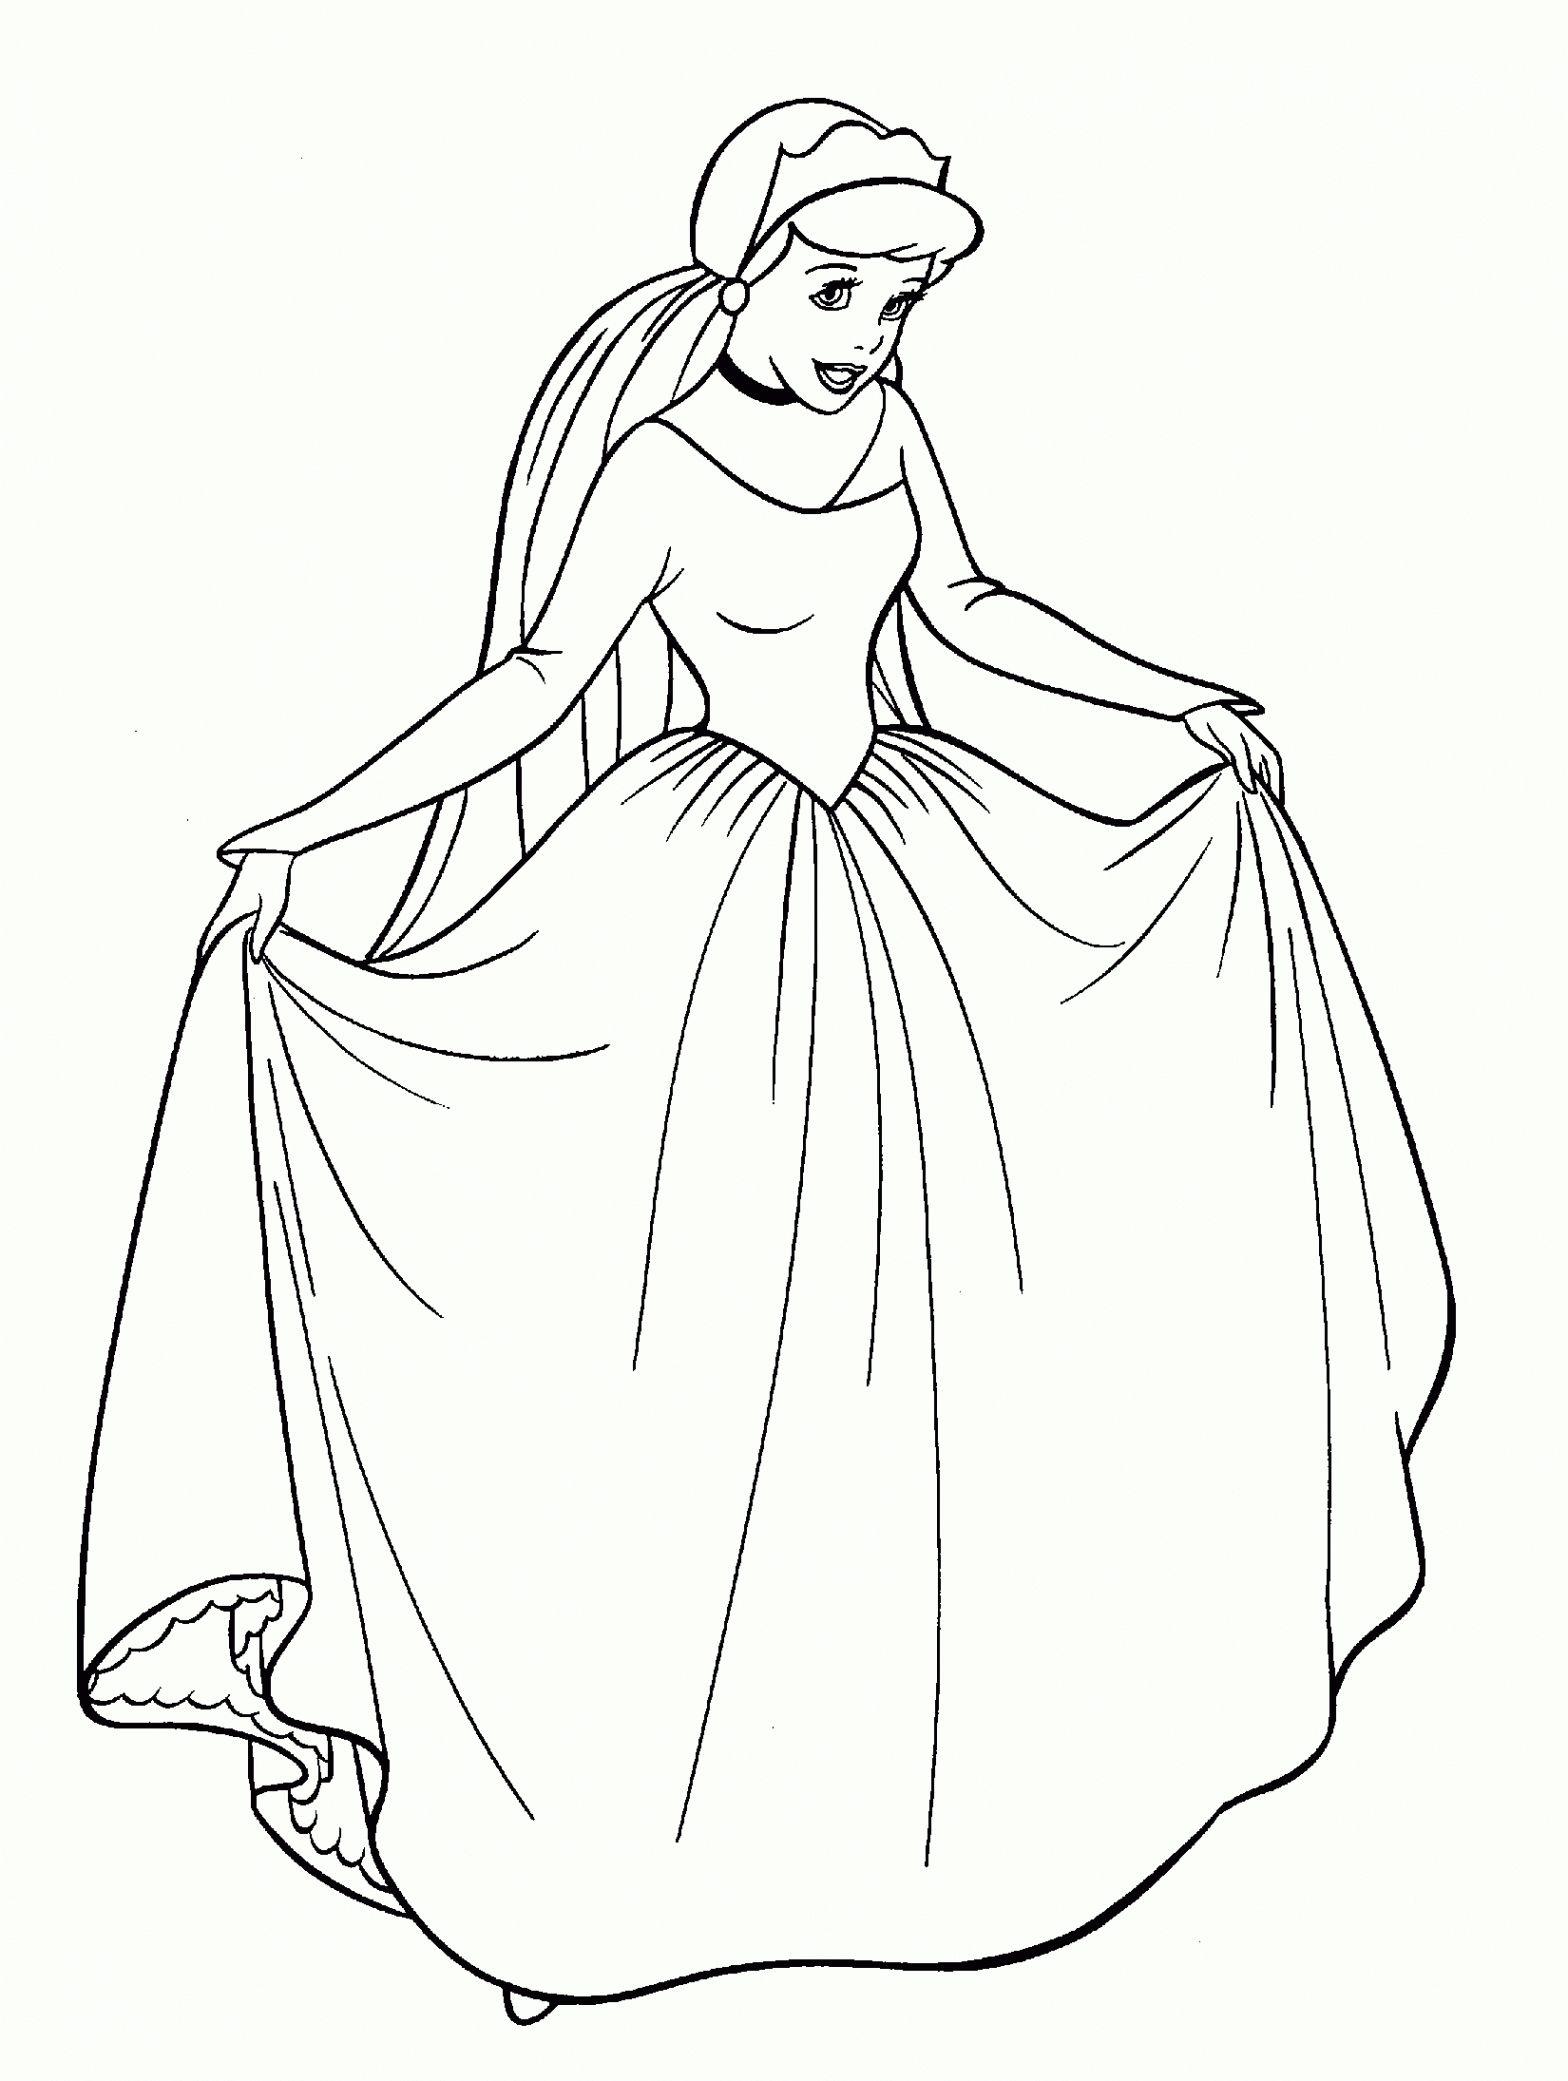 Coloriage Princesse Disney En Ligne - KBACHA.COM | KBACHA.COM | Coloriage cendrillon, Coloriage ...